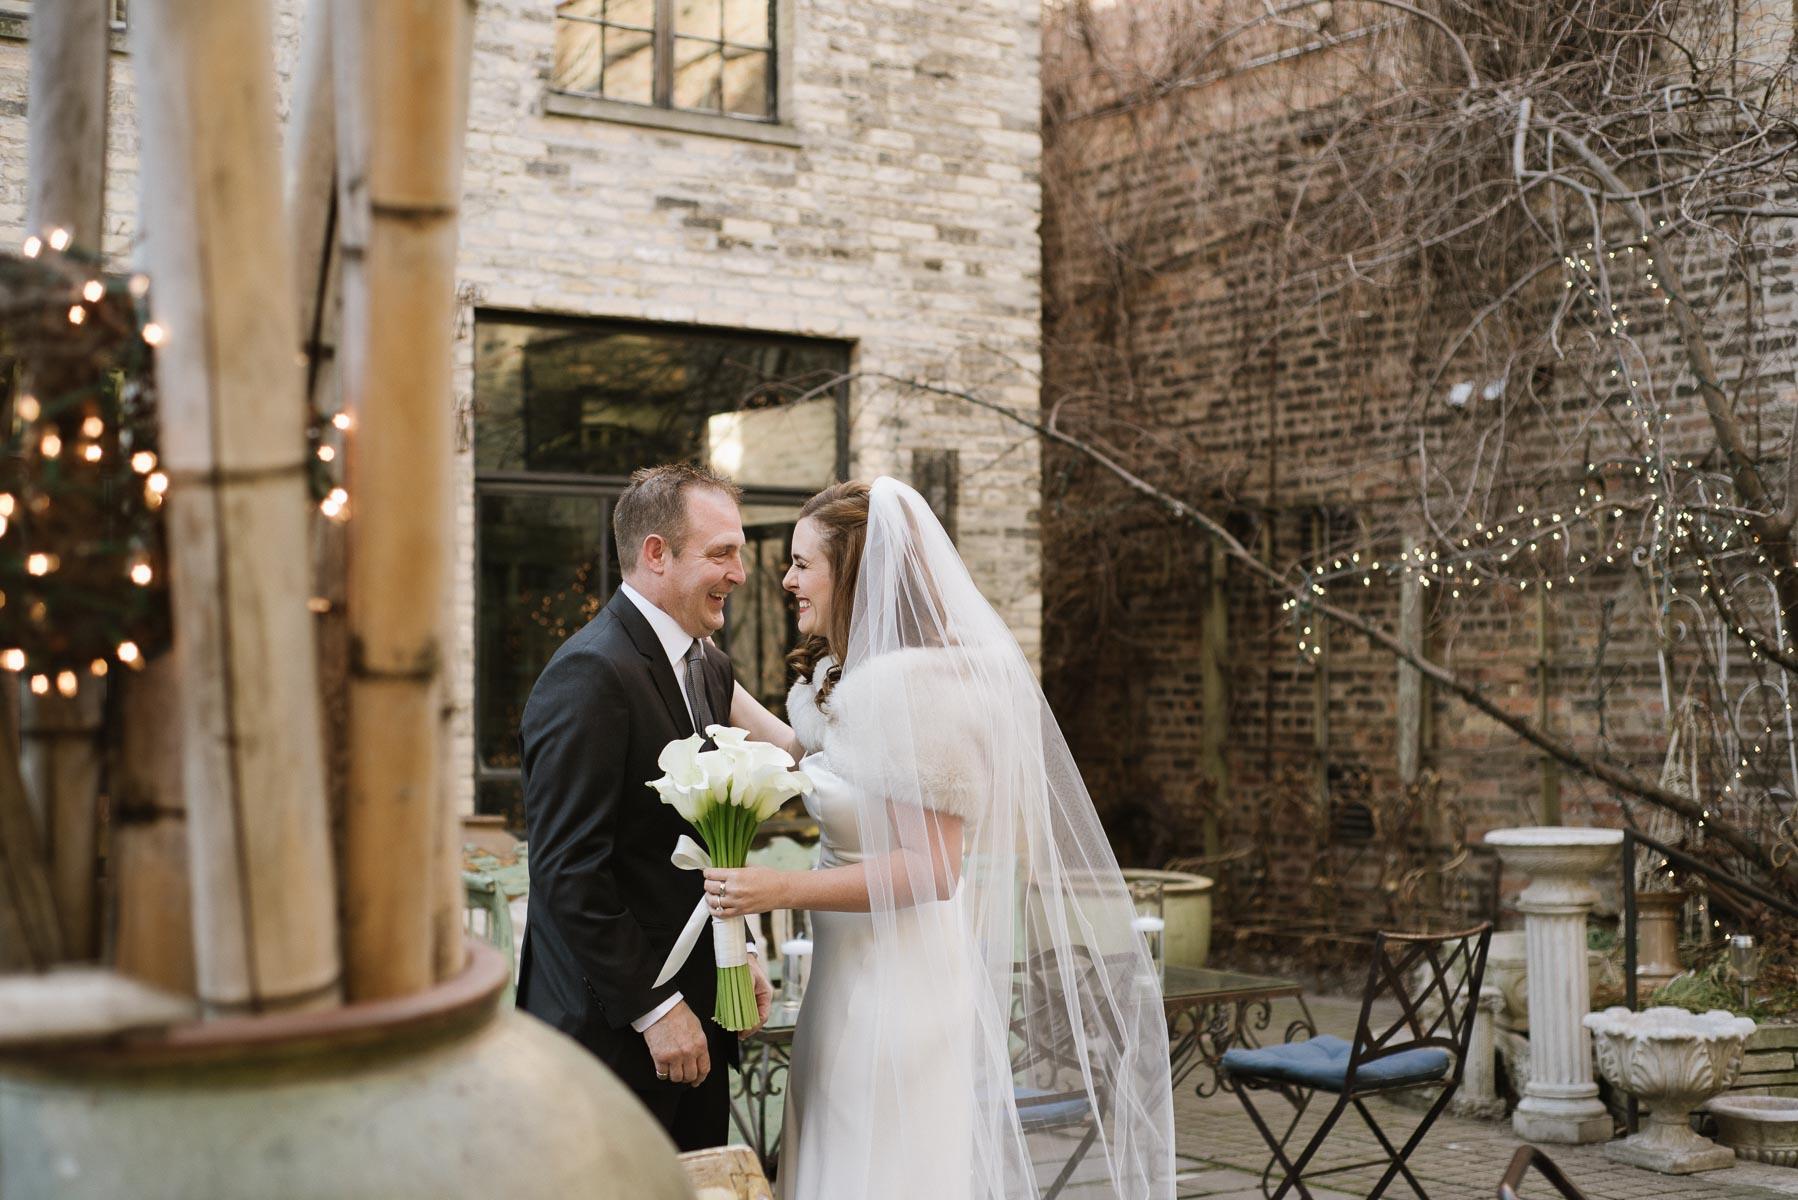 Pamela Yasuko Photography - A New Leaf Wedding - Chicago Oahu Photographer-22.jpg